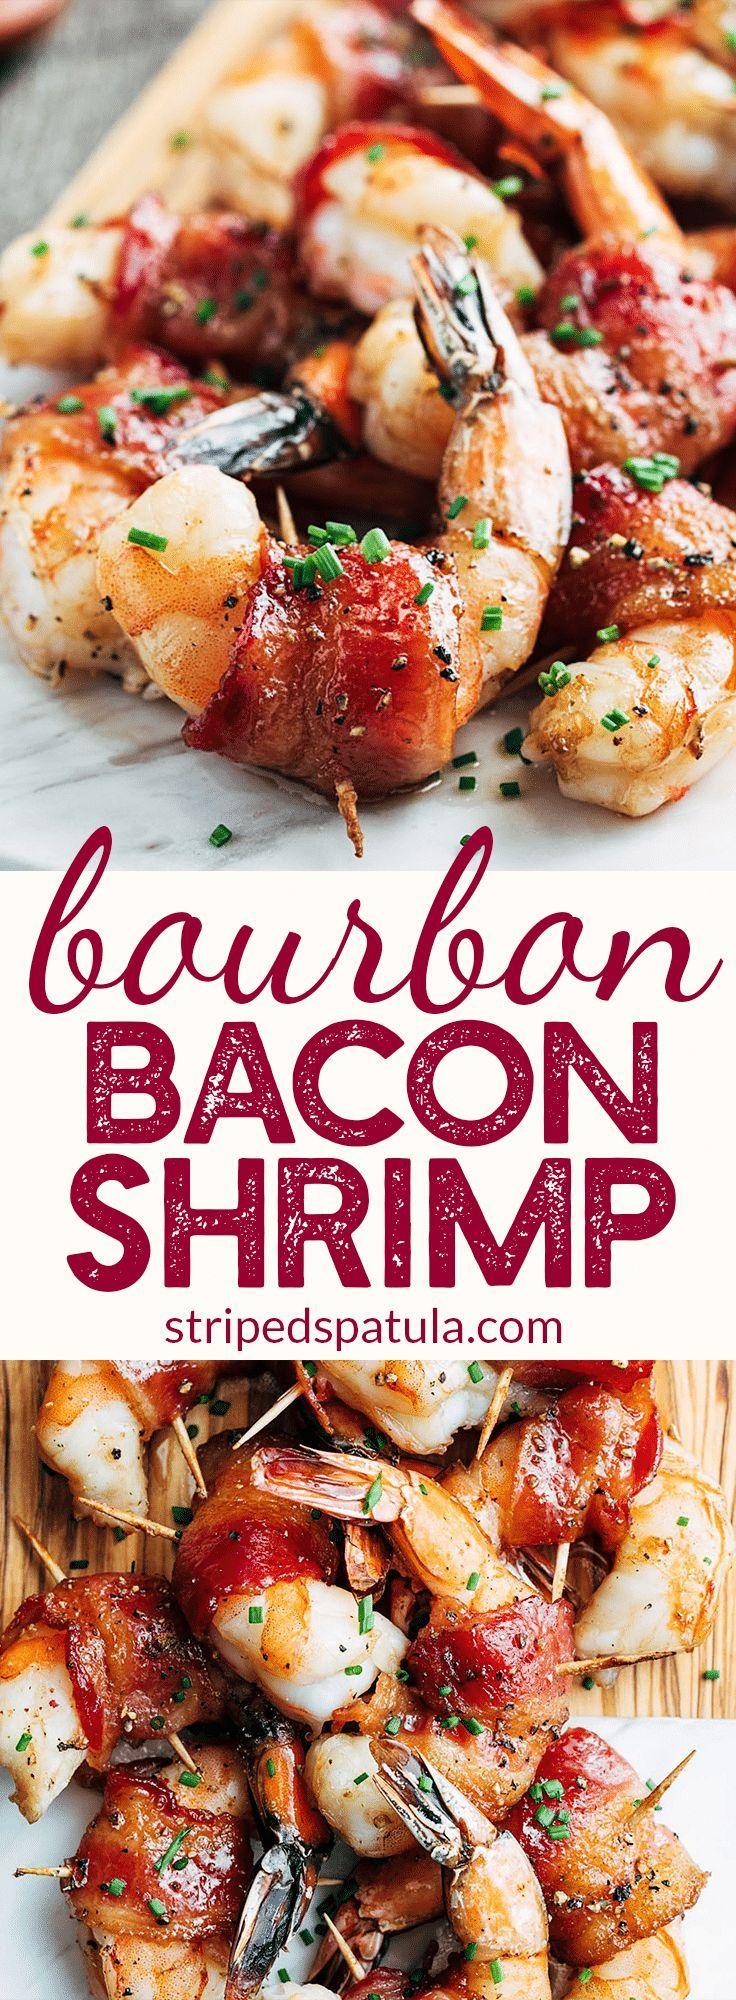 Photo of Bacon Wrapped Shrimp with Brown Sugar Bourbon Glaze